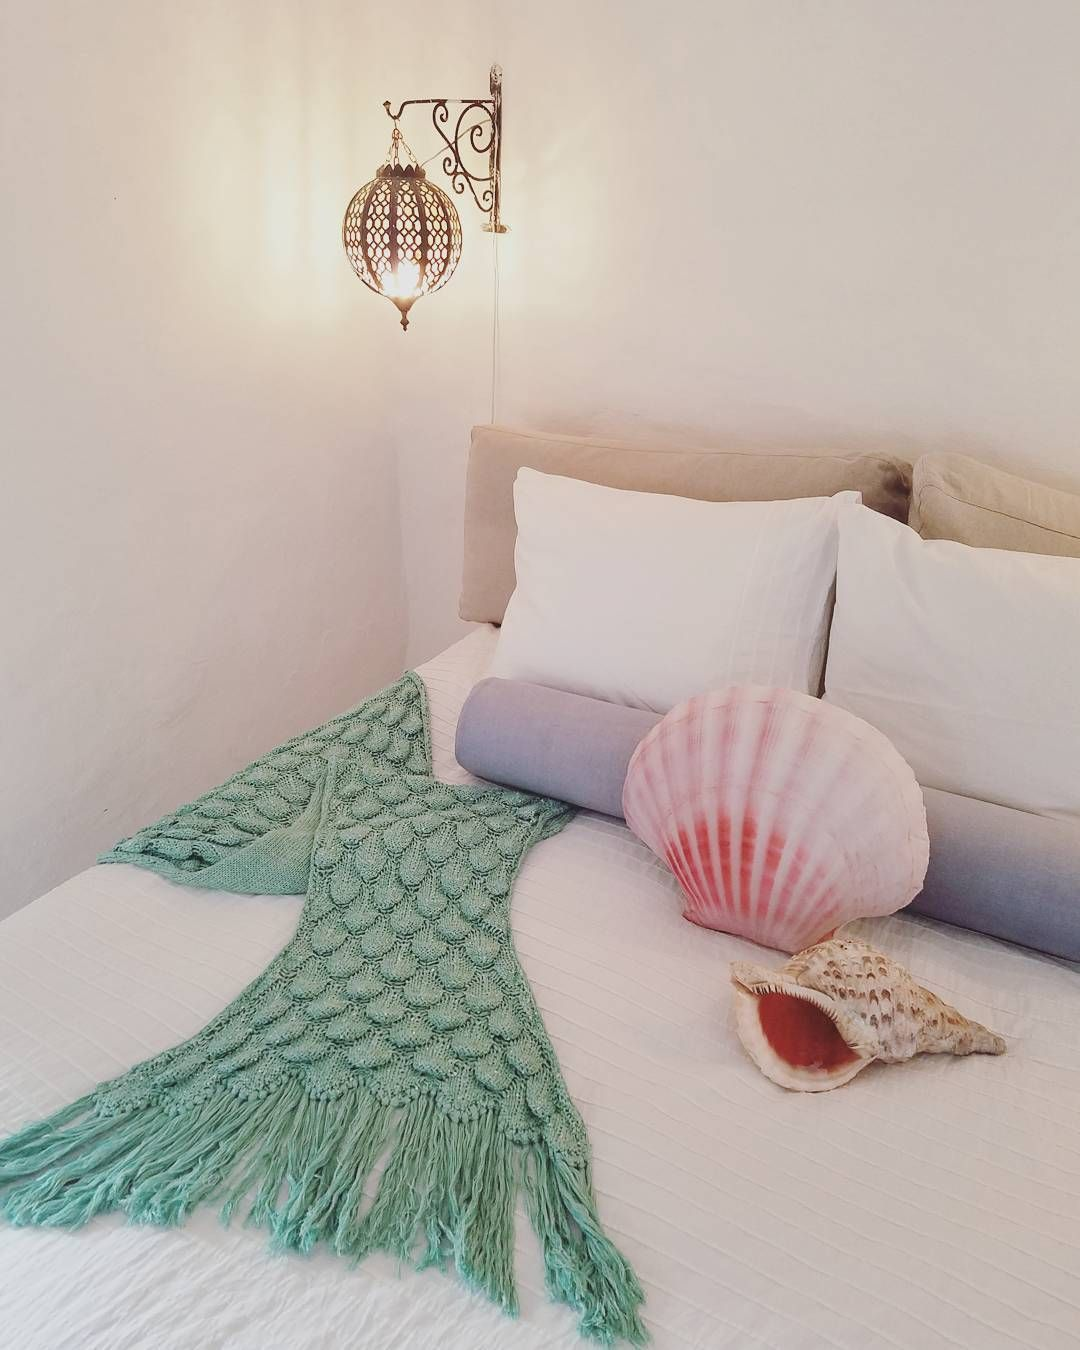 Dreamy Mermaid Den With Seatail Designs Mermaidtailblanket Shellpillow Mermaidbed Shell Bed Luxury Bedroom Furniture Bedroom Design Mermaid Room Decor